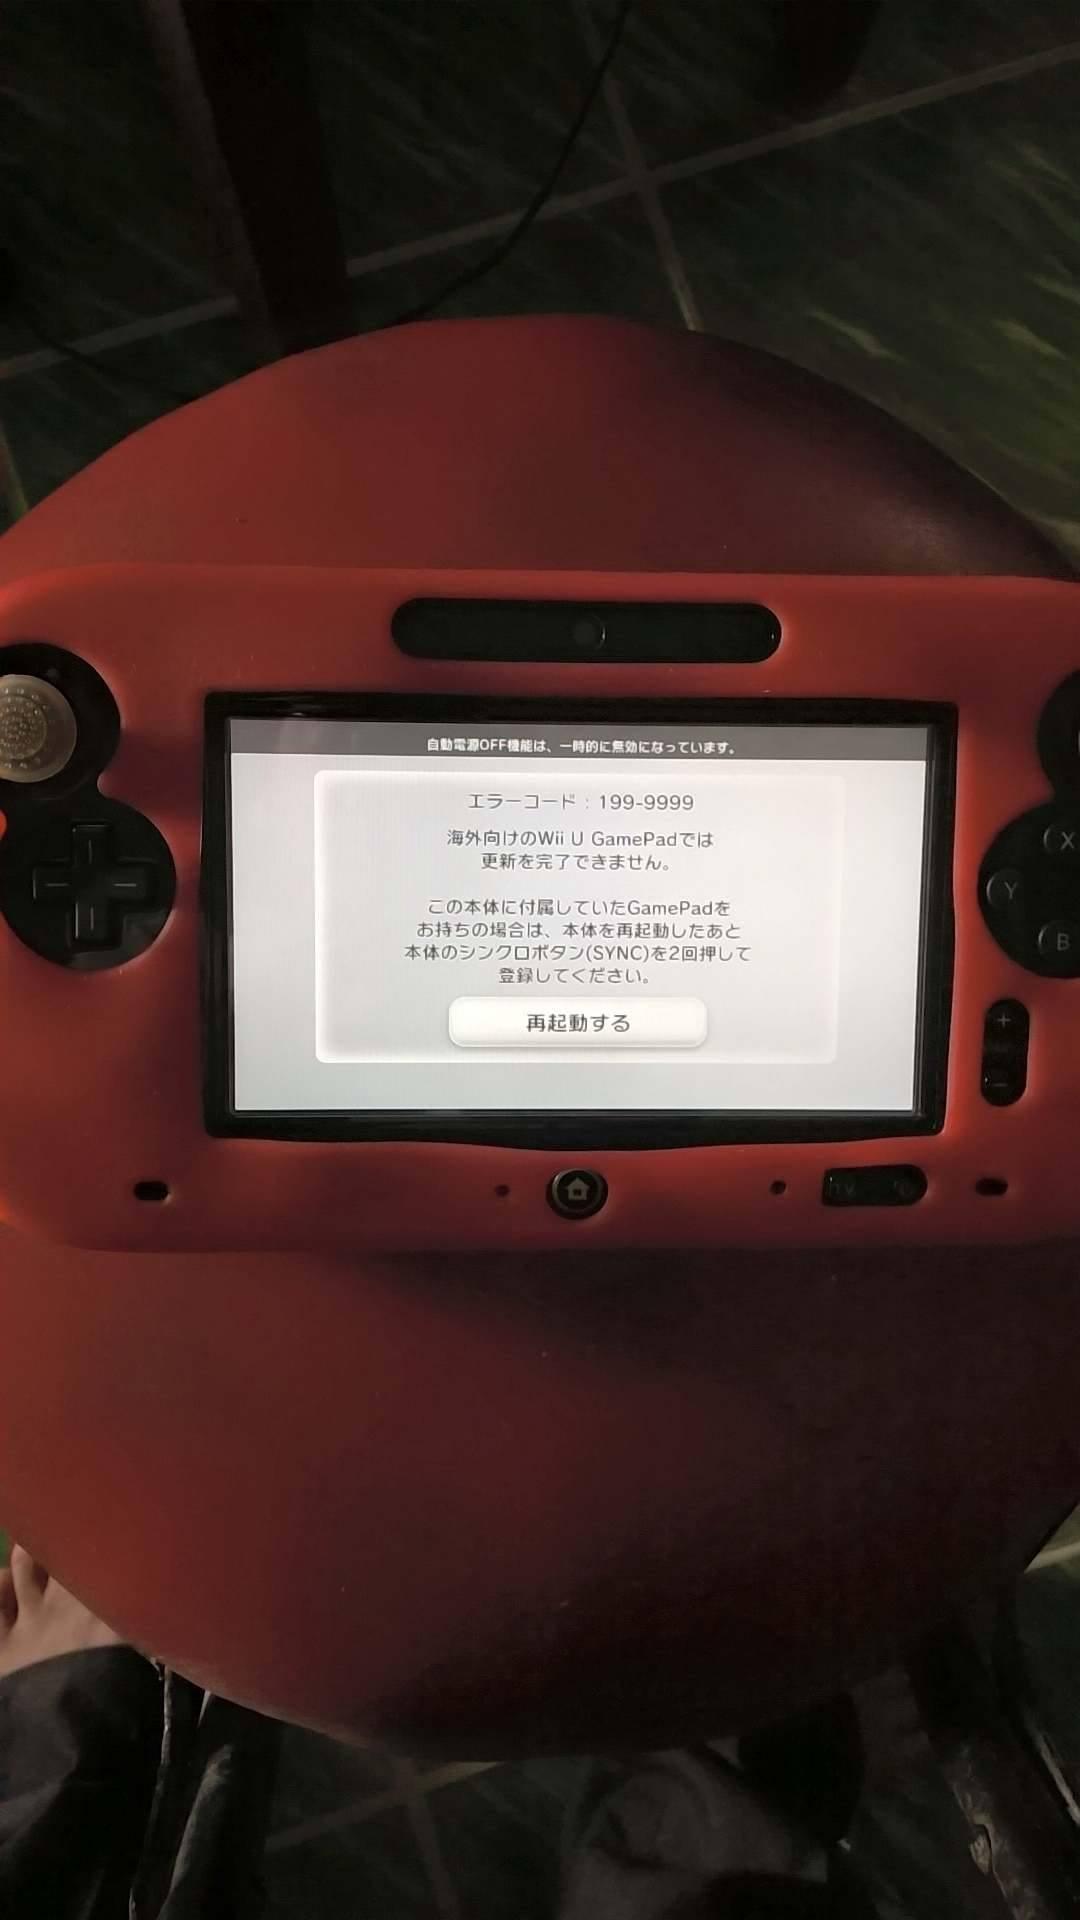 gamepad us + wiiu jp   GBAtemp net - The Independent Video